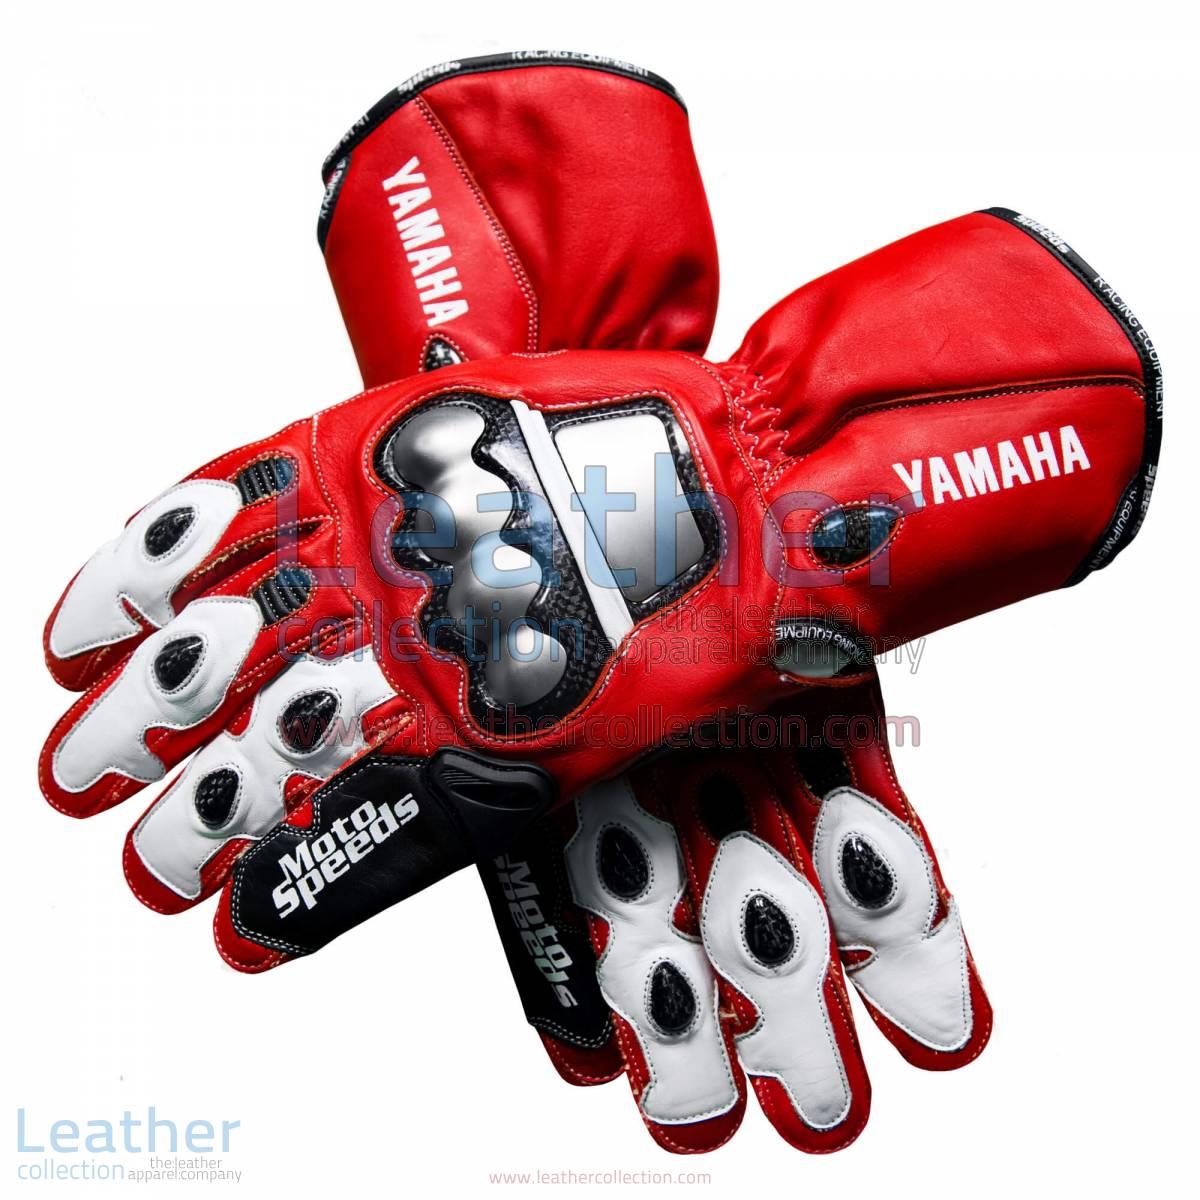 Valentino Rossi Yamaha MotoGP (Spain) 2005 Gloves   Valentino Rossi Yamaha MotoGP (Spain) 2005 Gloves